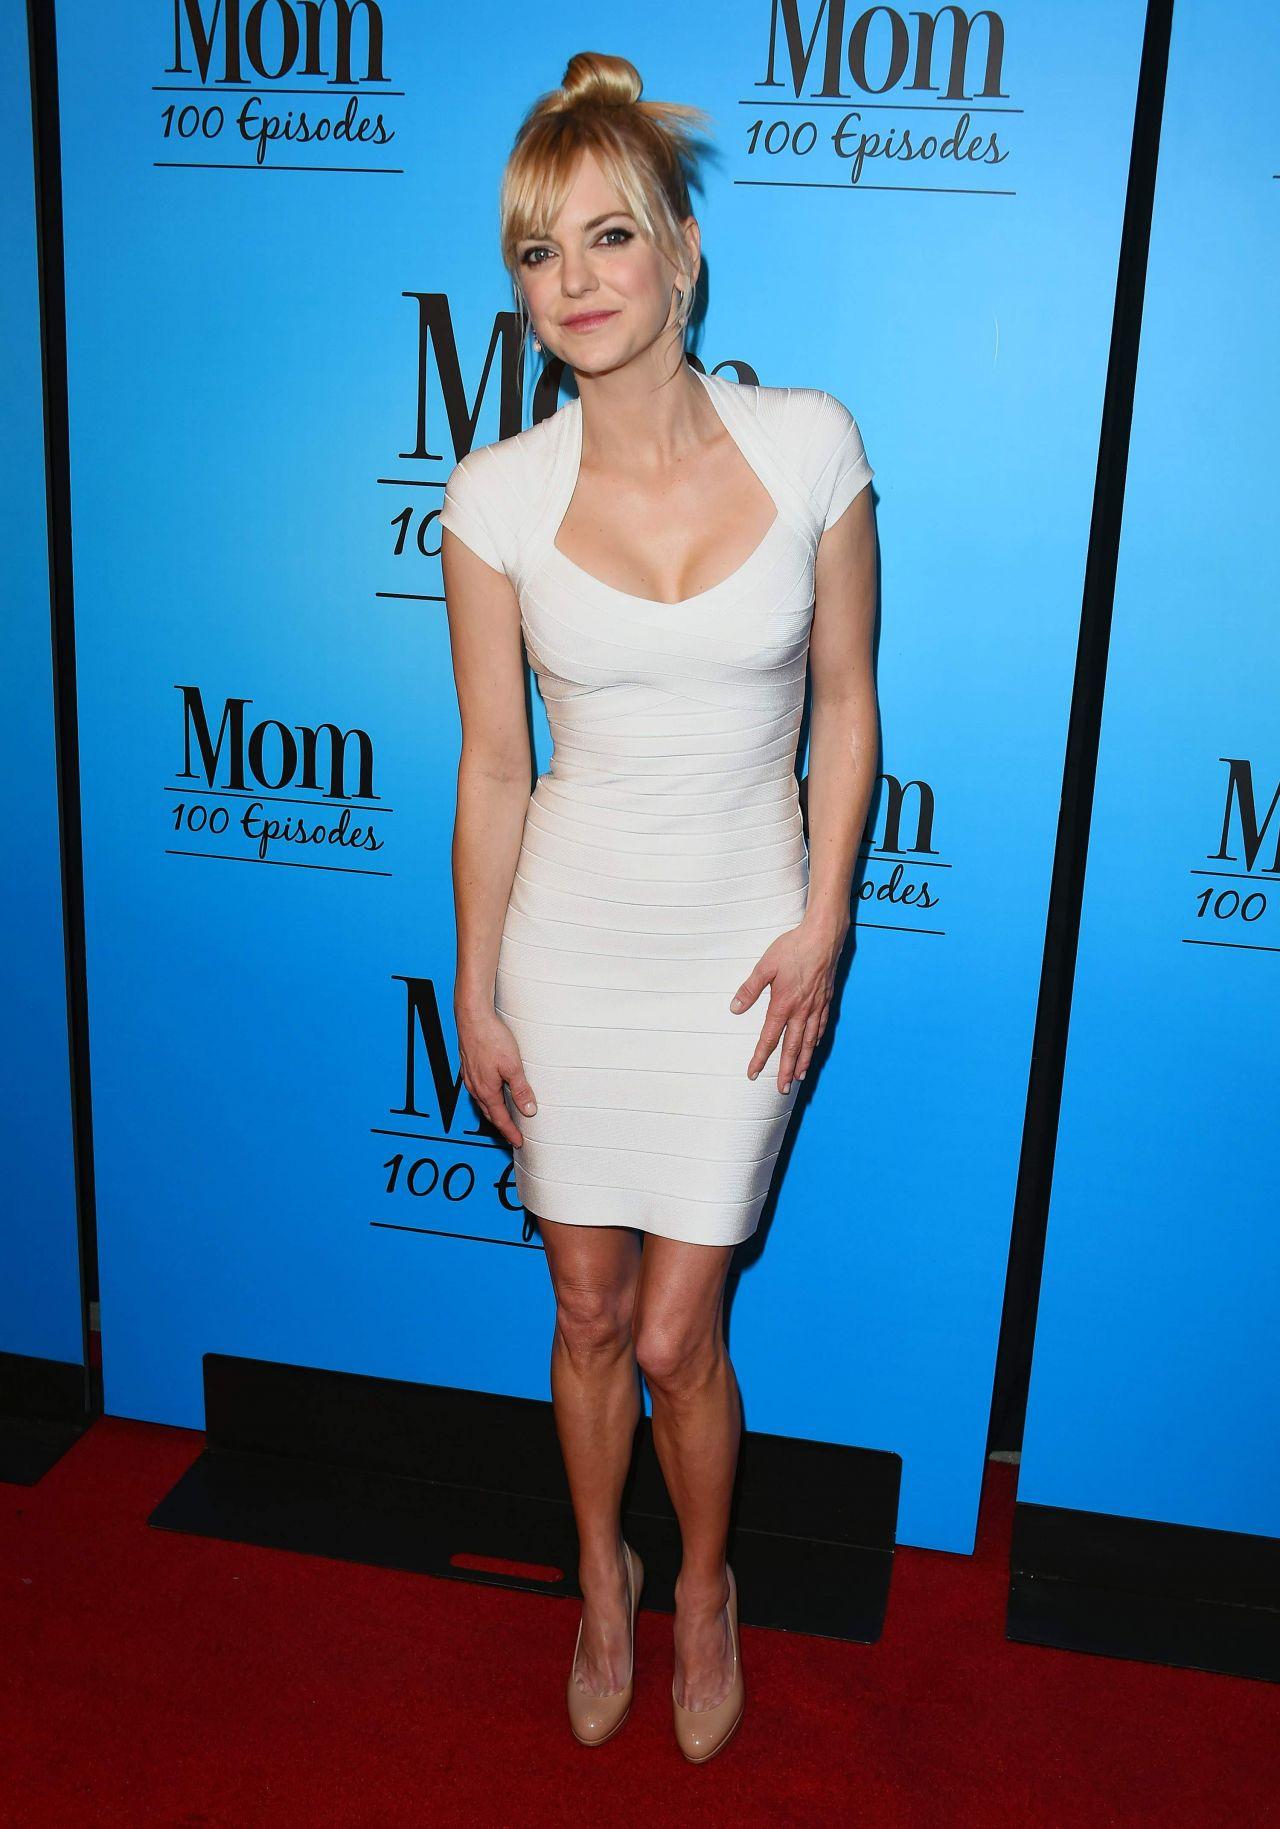 Anna Faris Quot Mom Quot Celebrates 100 Episodes In Los Angeles